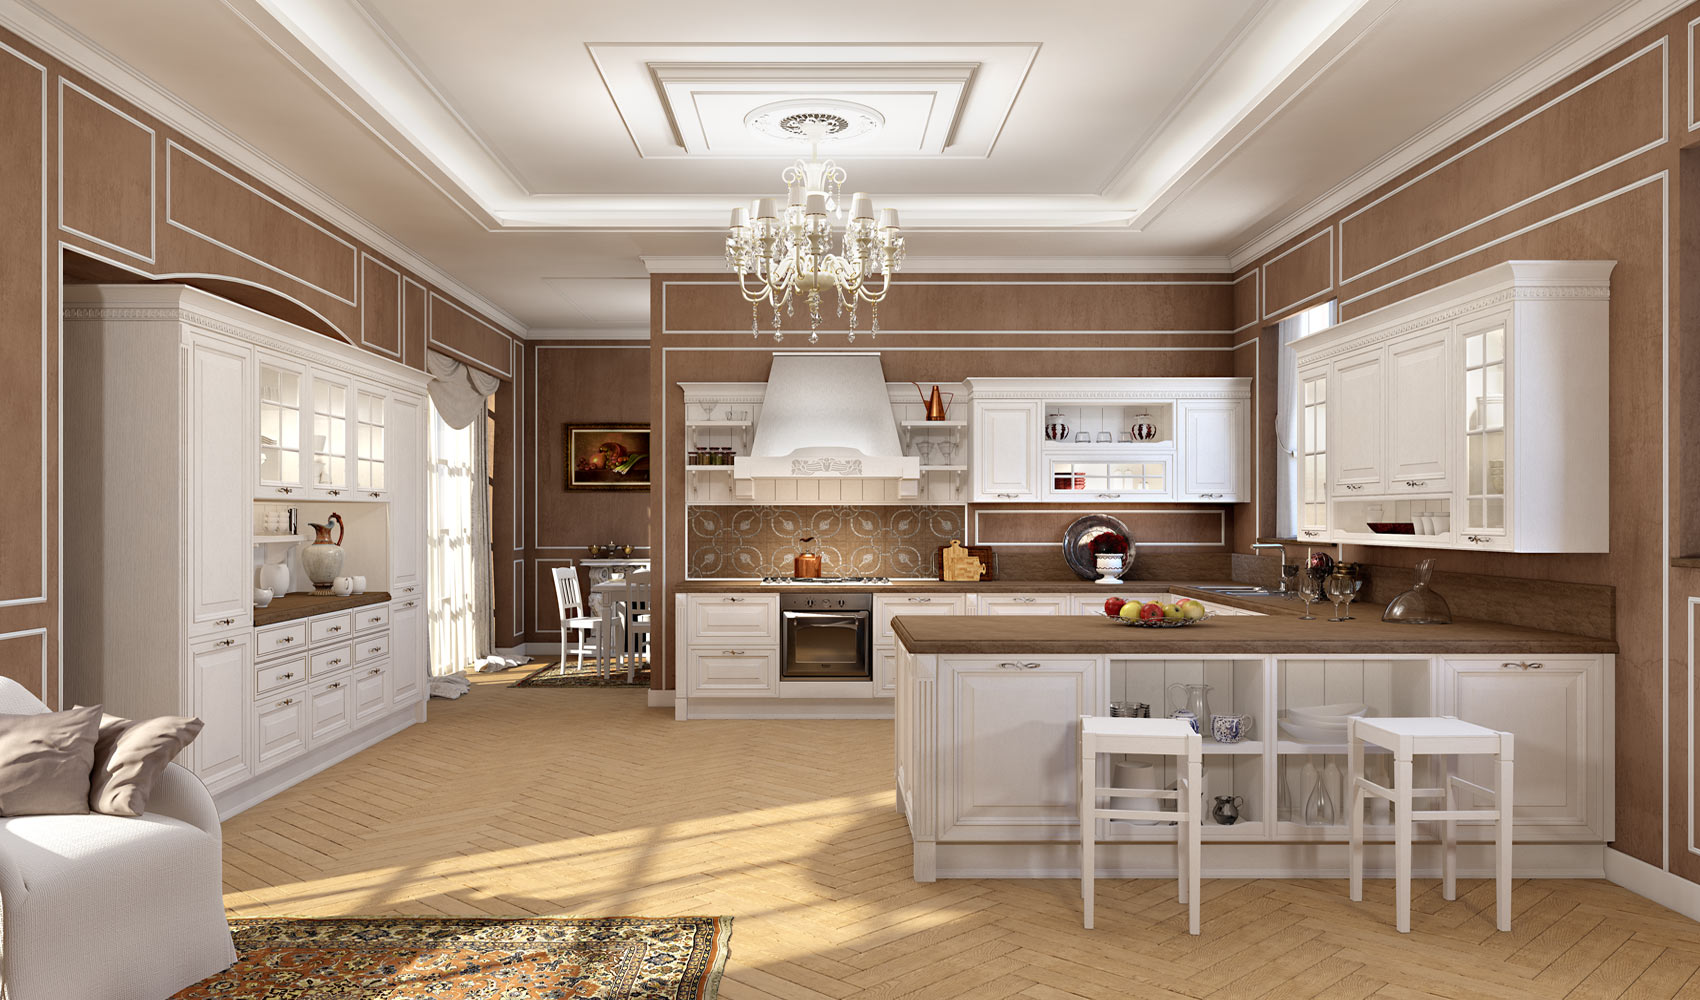 Foto di cucine classiche good dettaglio cucina stosa - Cucine classiche immagini ...